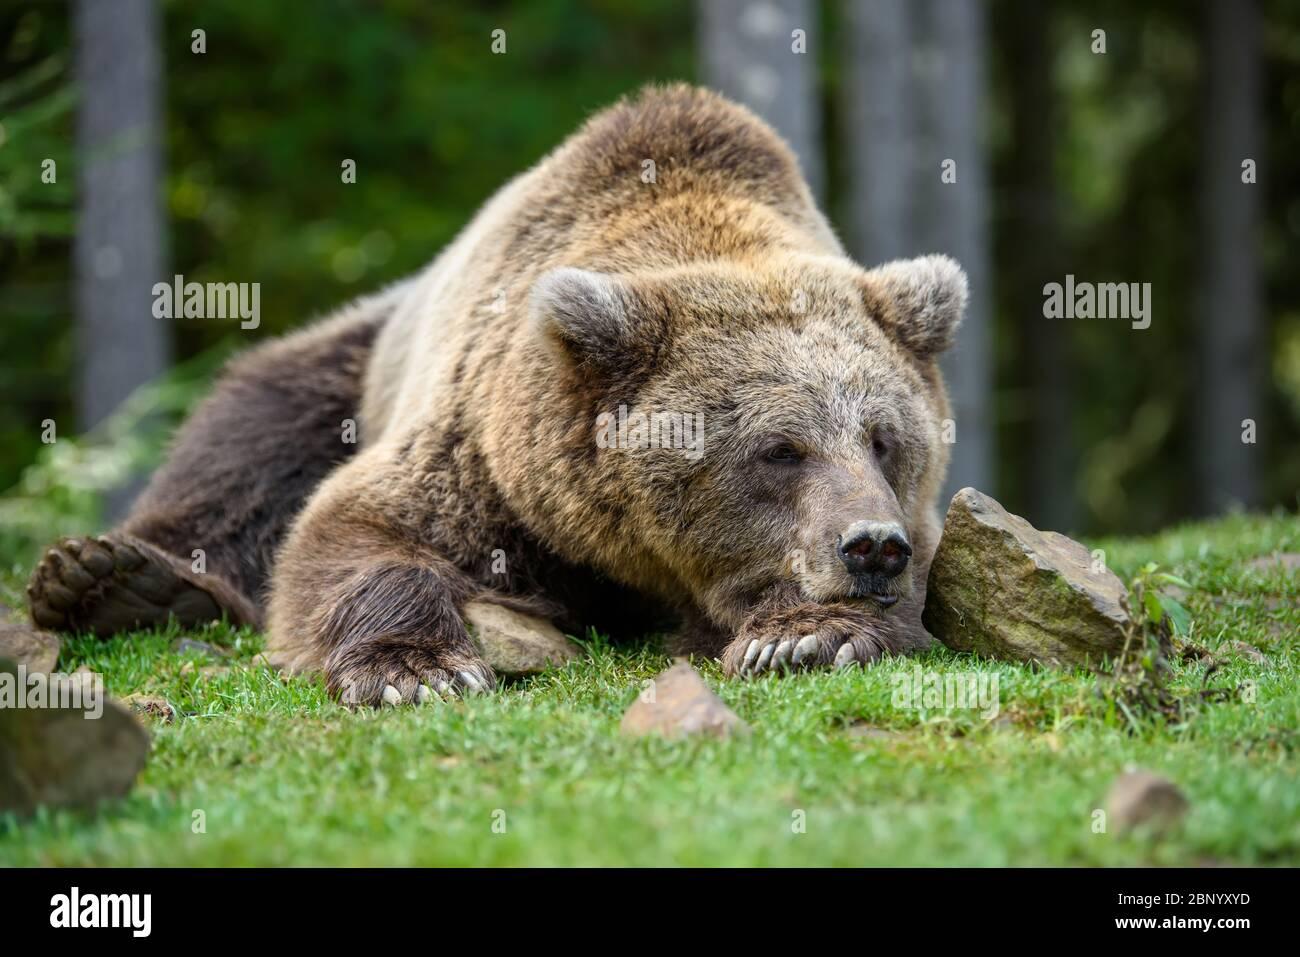 Close-up sleep brown bear portrait. Danger animal in nature habitat. Big mammal. Wildlife scene Stock Photo